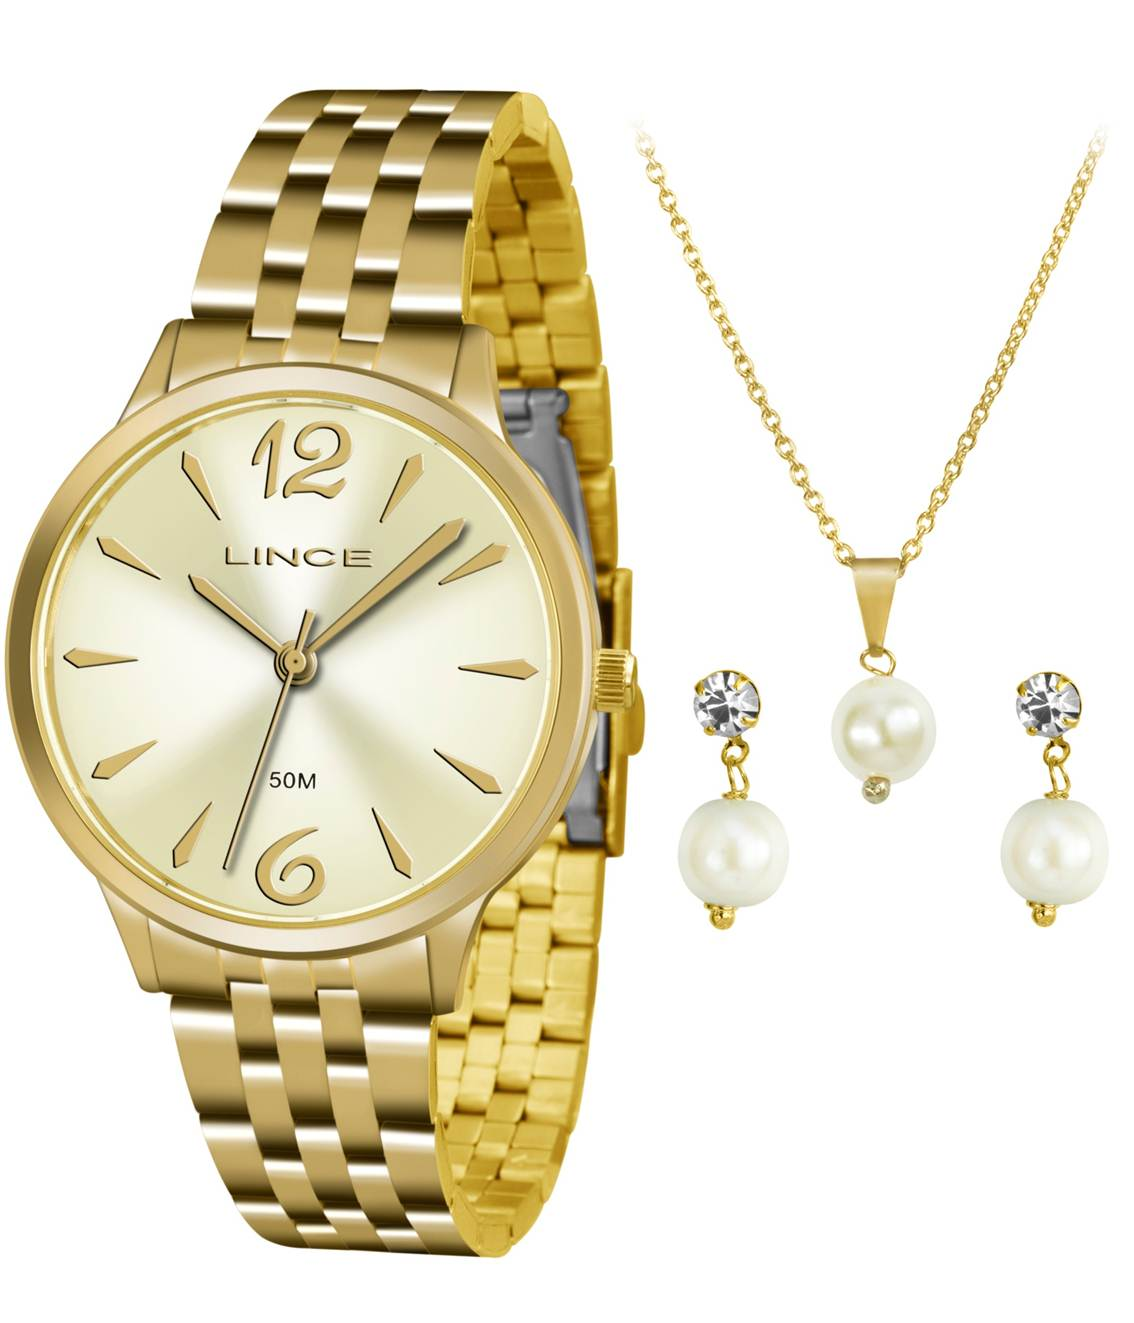 7a881597a30 Relógio Lince Feminino Kit LRGH047L KT91C2KX Colar + Brinco - Janne ...